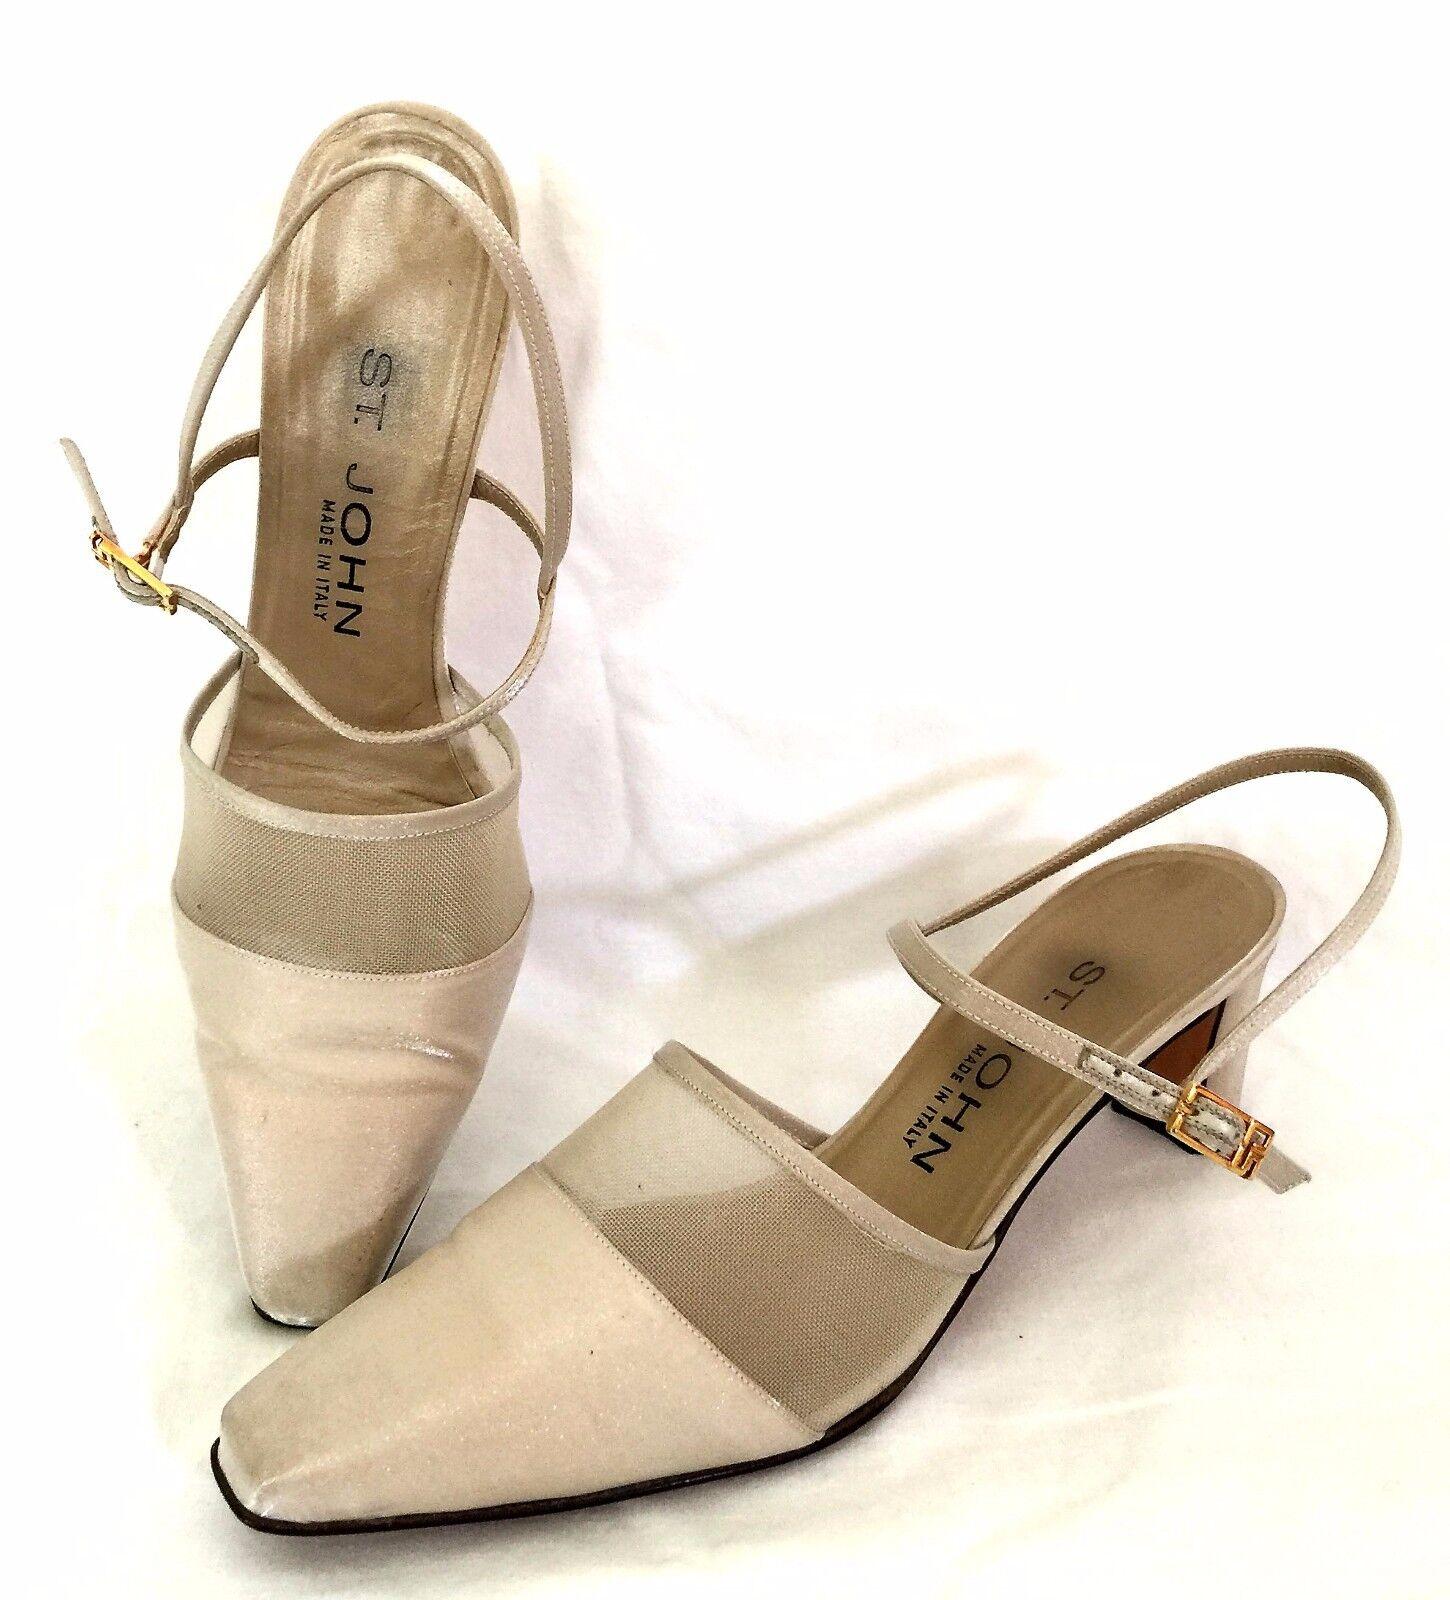 St. John Soft gold Fabric and Netting Slingback Evening shoes - Size 7 AA - EUC